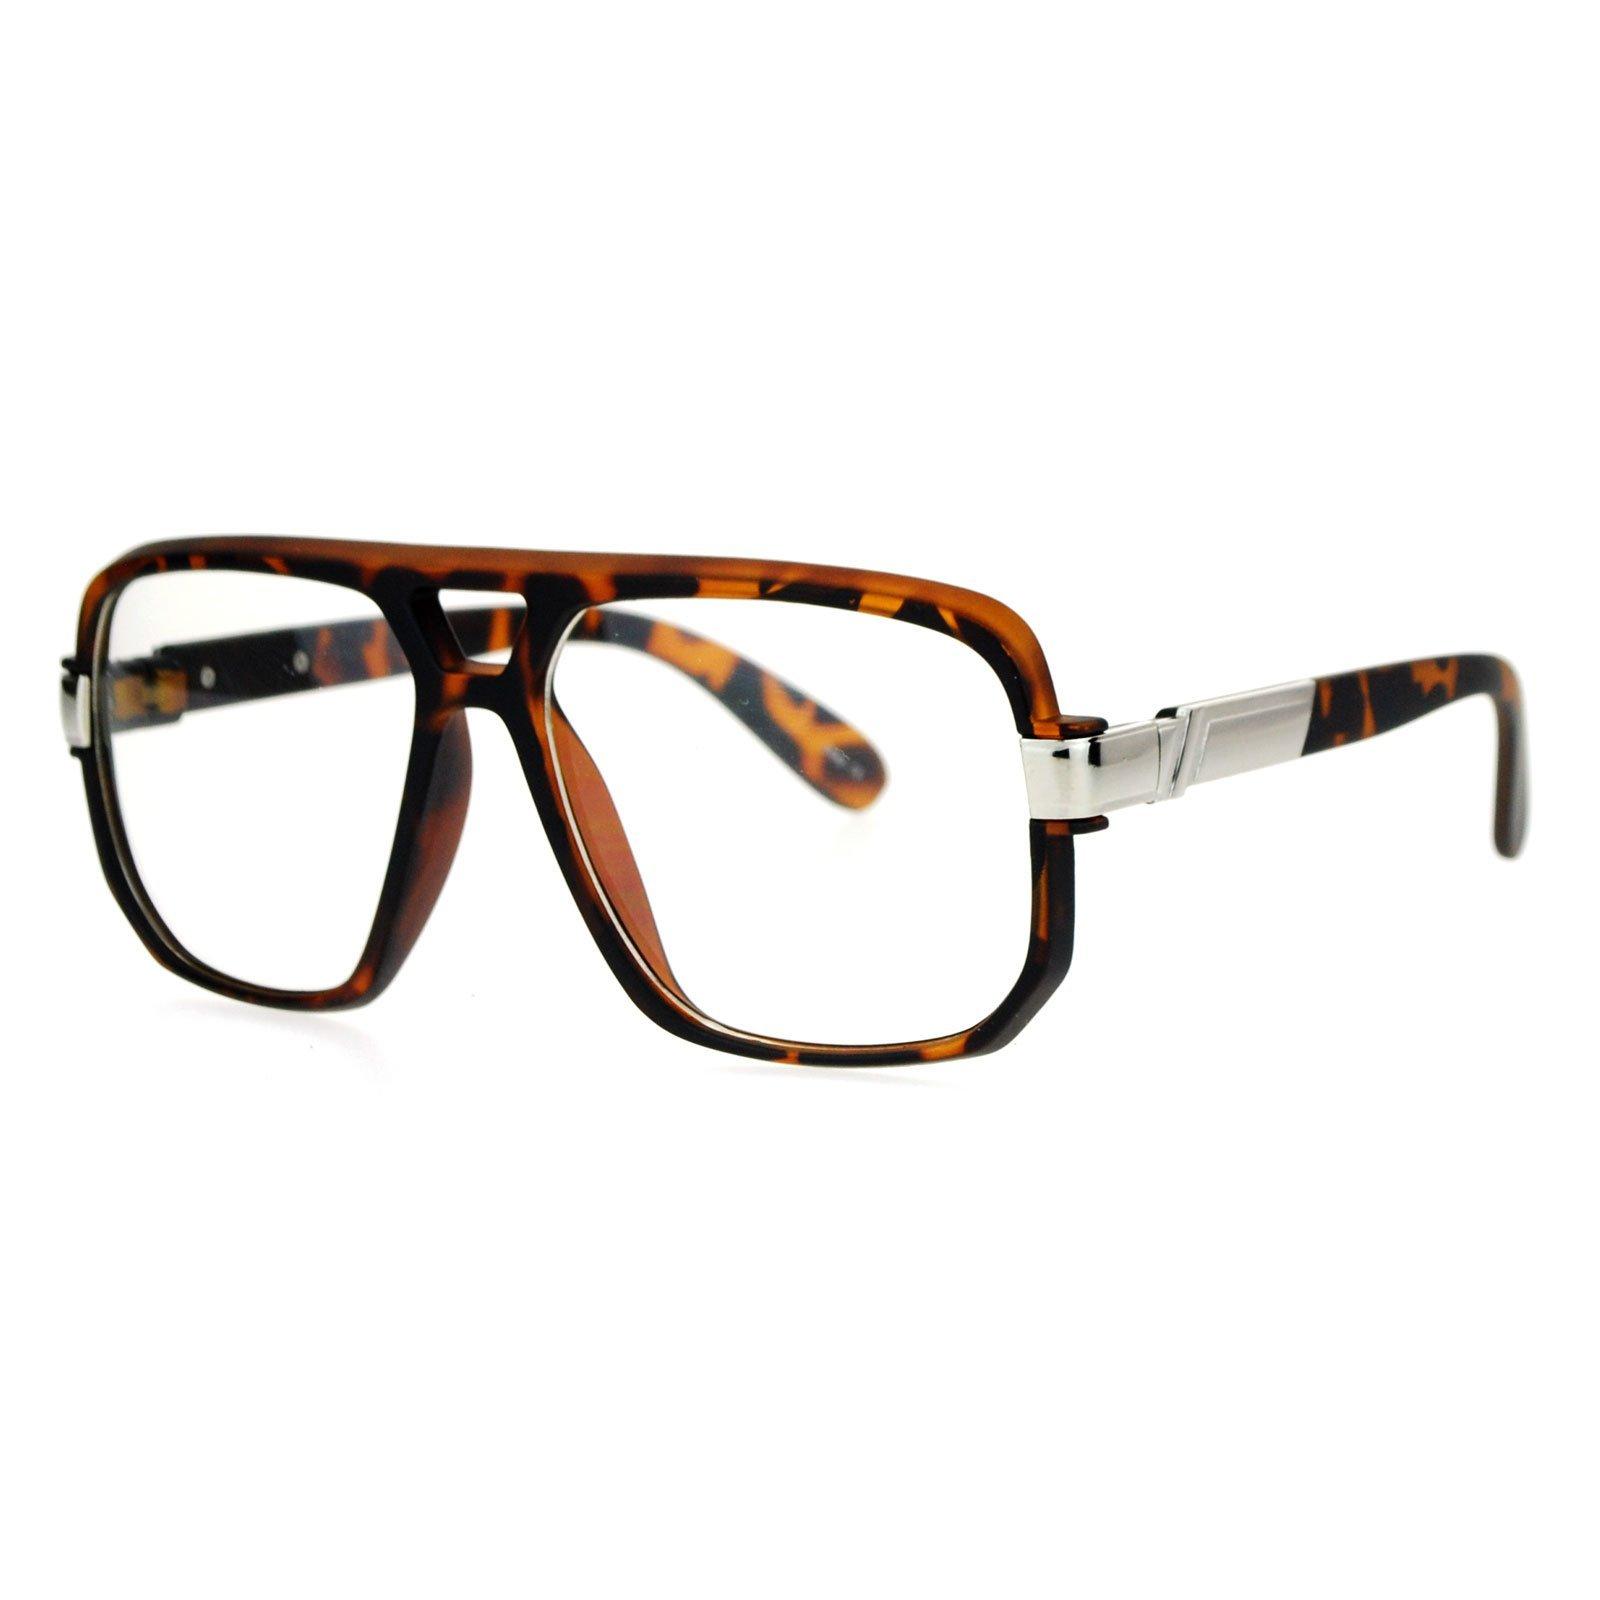 SA106 Retro Hip Hop Rapper Oversize Rectangular Mob Eye Glasses Tortoise